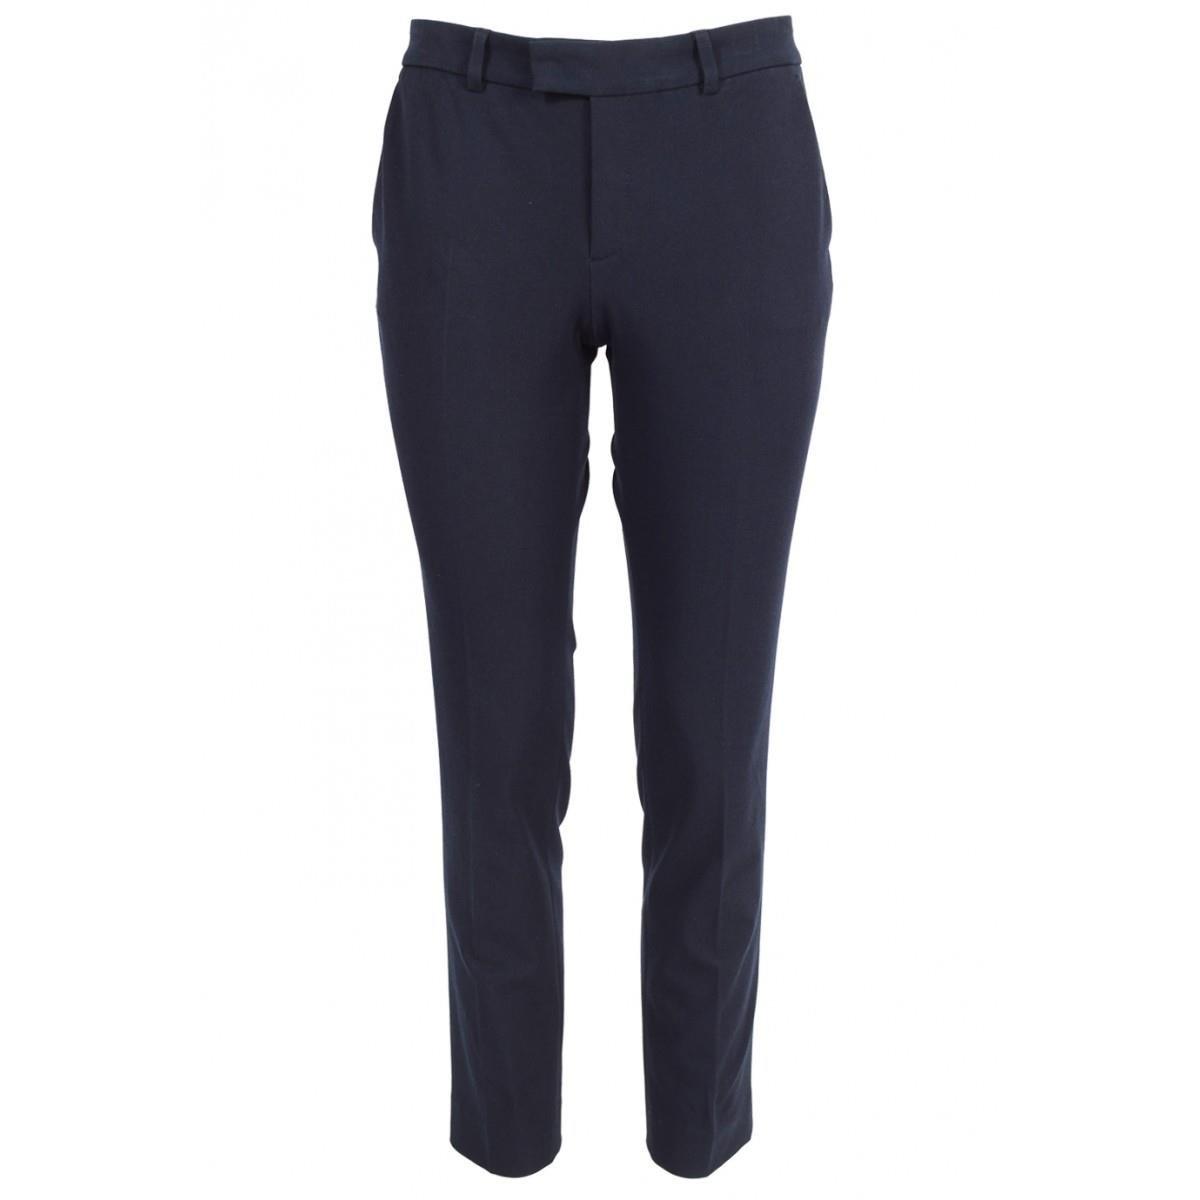 Leon & Harper Palmora Pantalones para Mujer